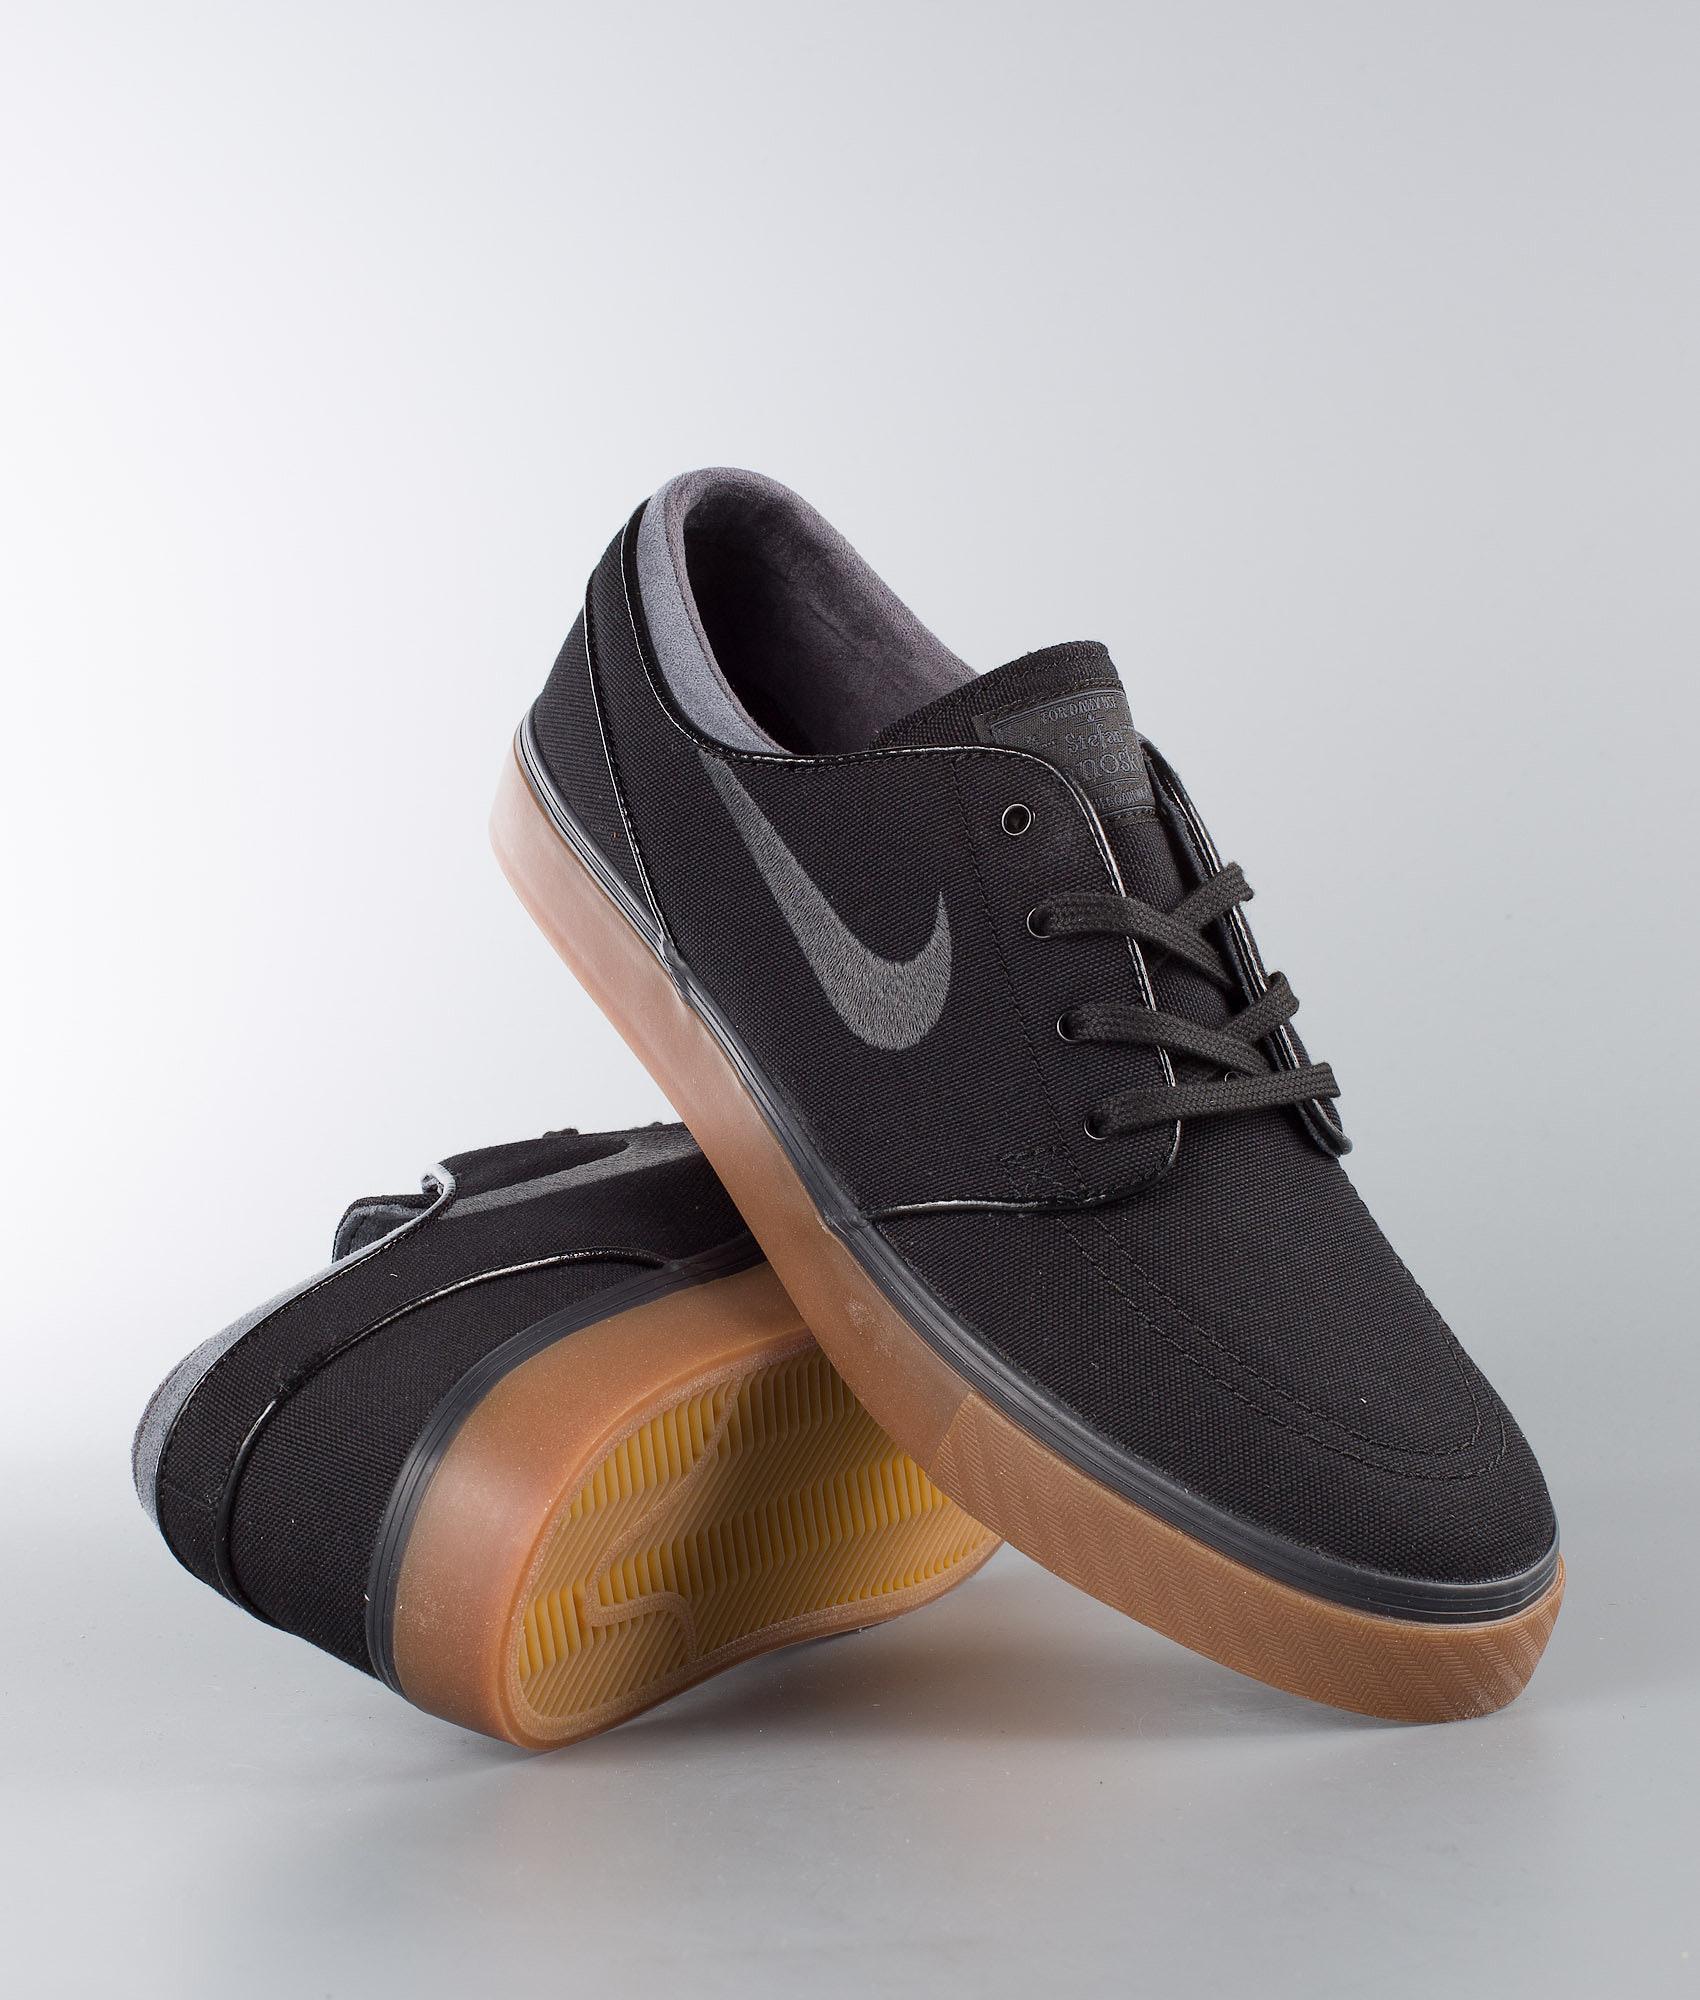 c9c55fa1b2e827 Nike Zoom Stefan Janoski Cnvs Shoes Black Anthracite-Gum Med Brown ...